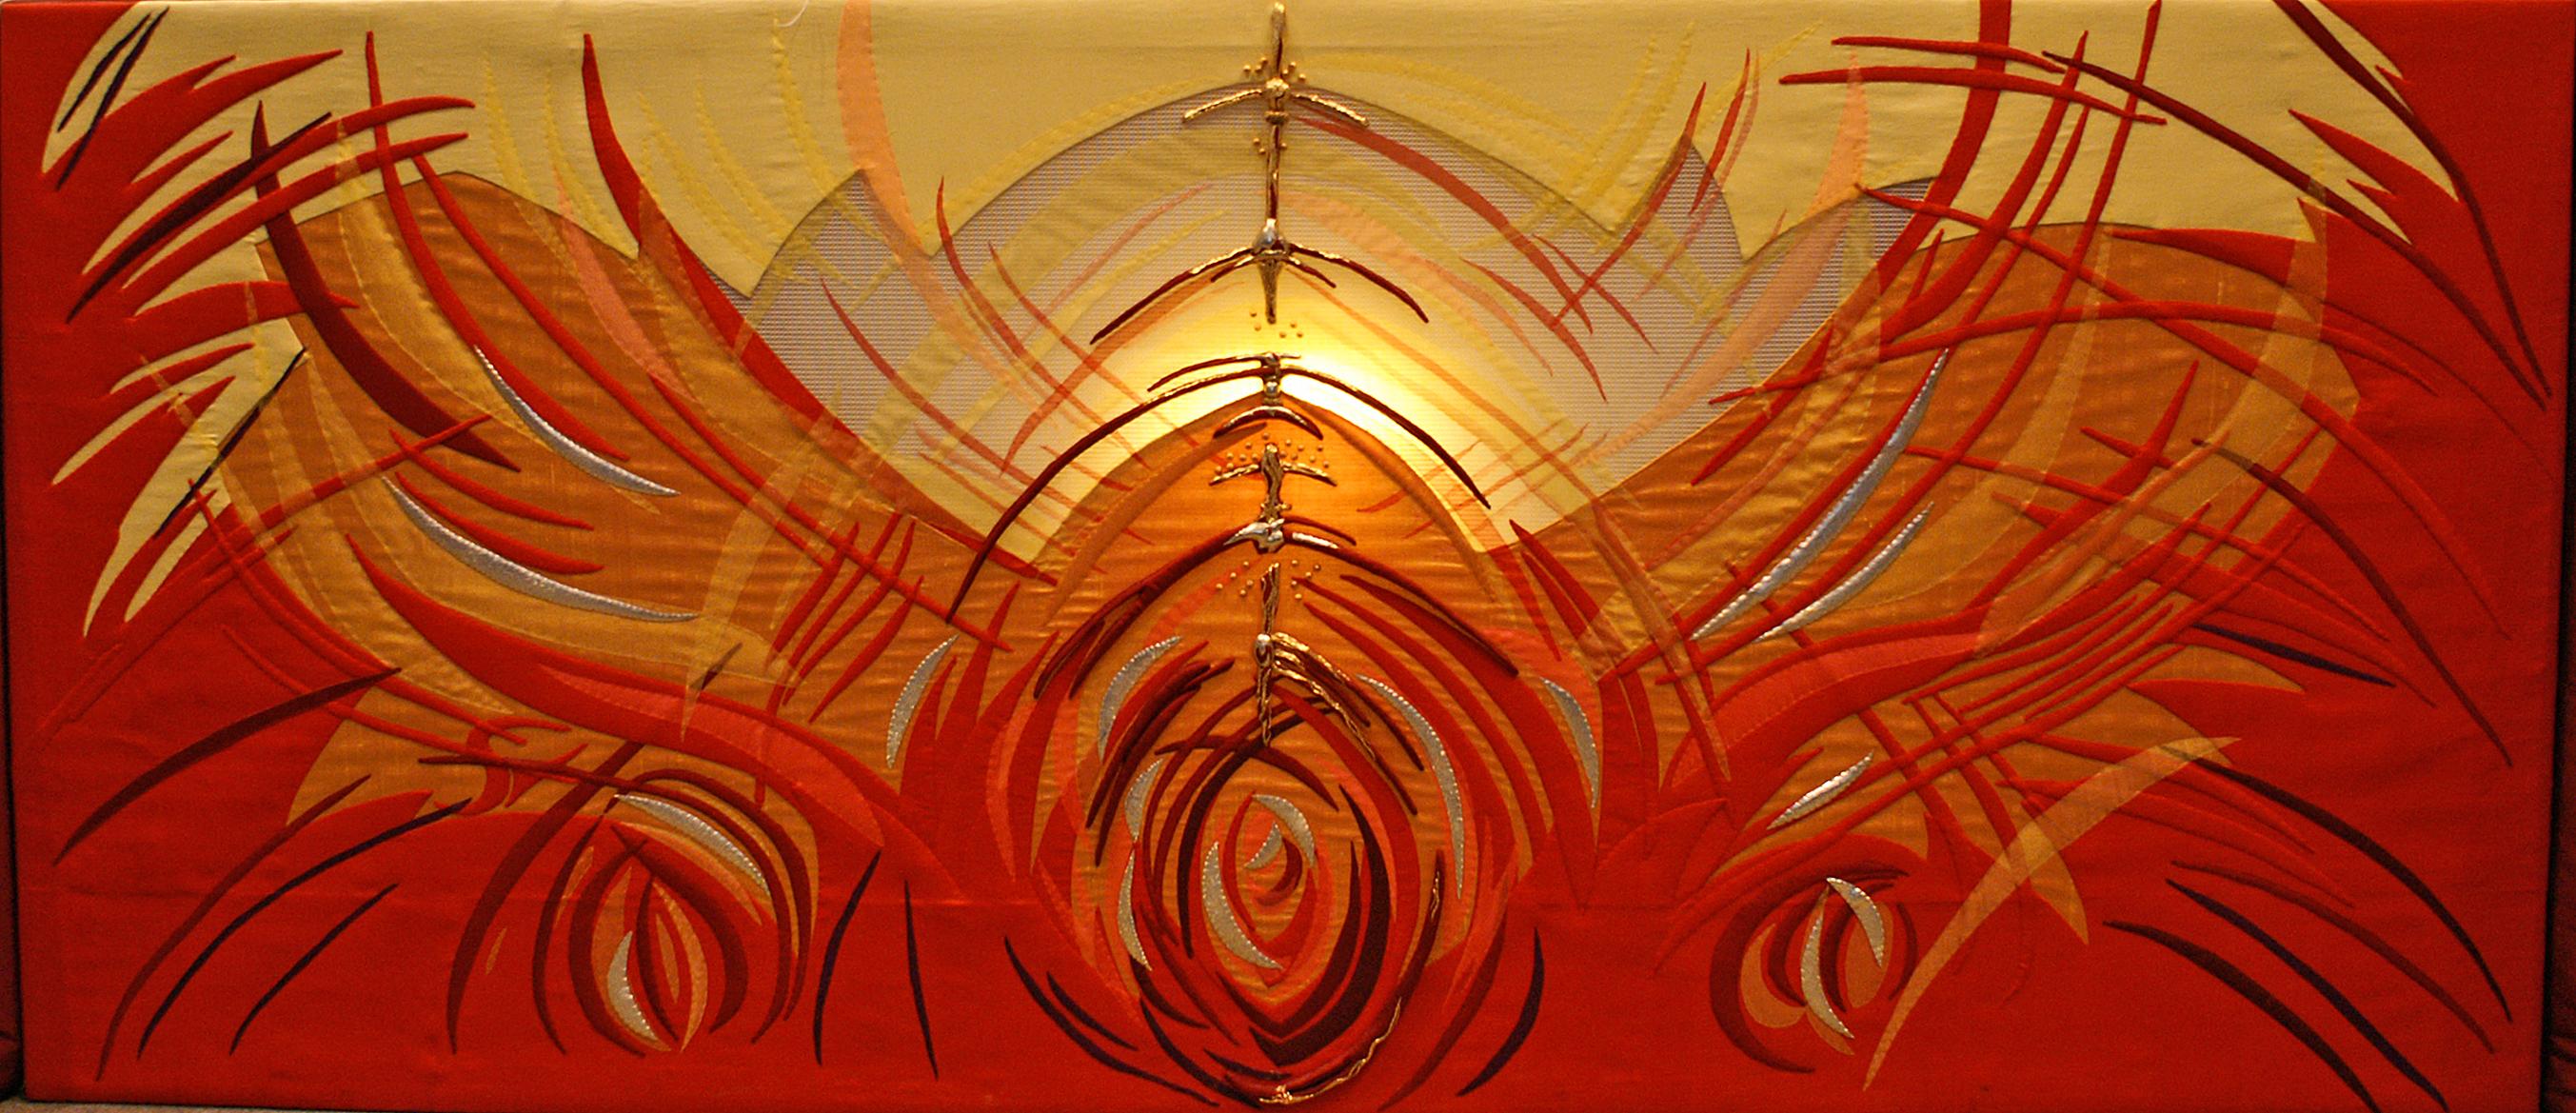 Prayer at Pentecost